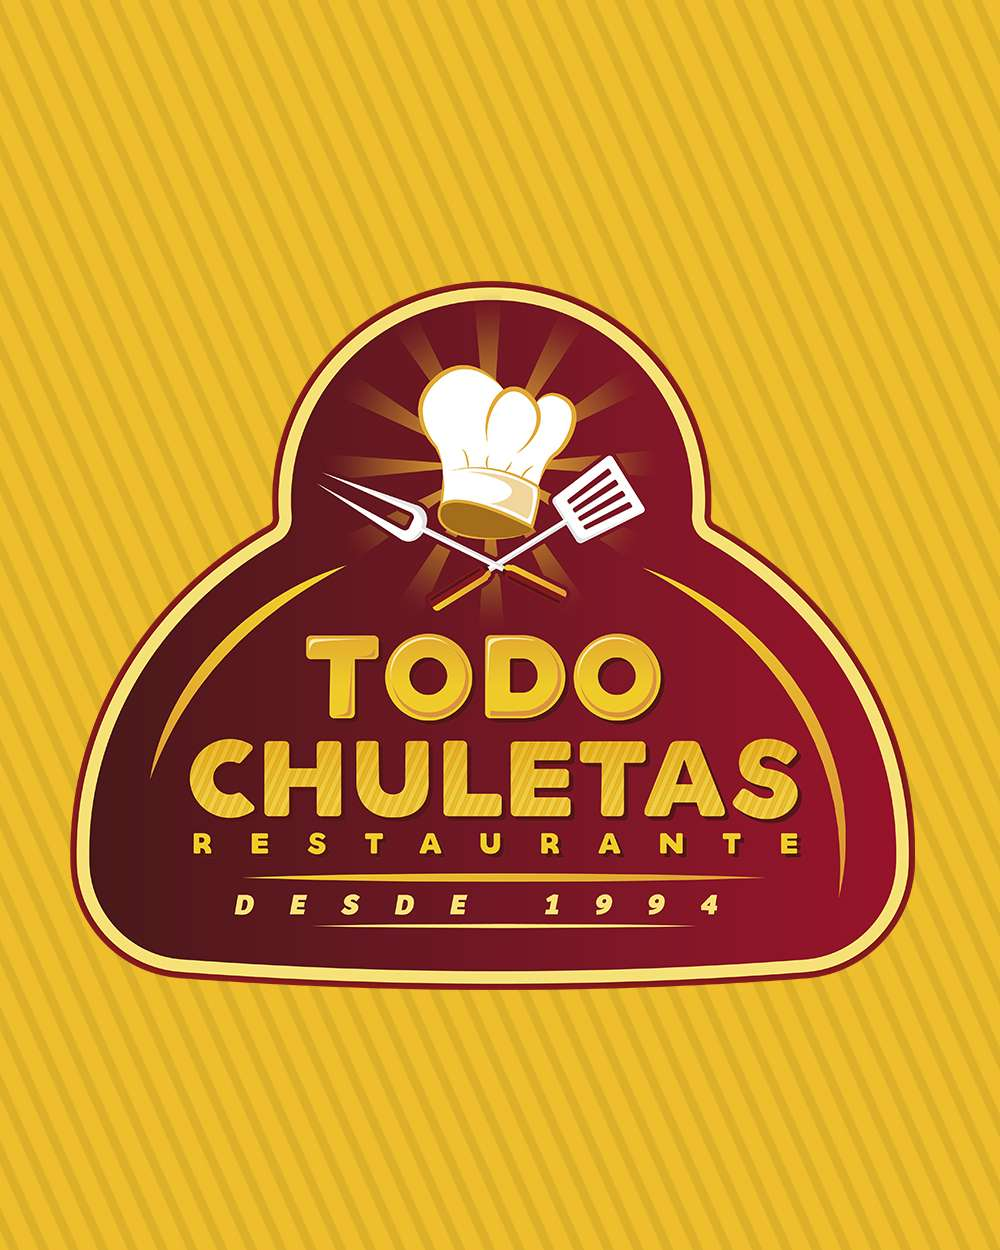 Todo Chuletas Restaurante